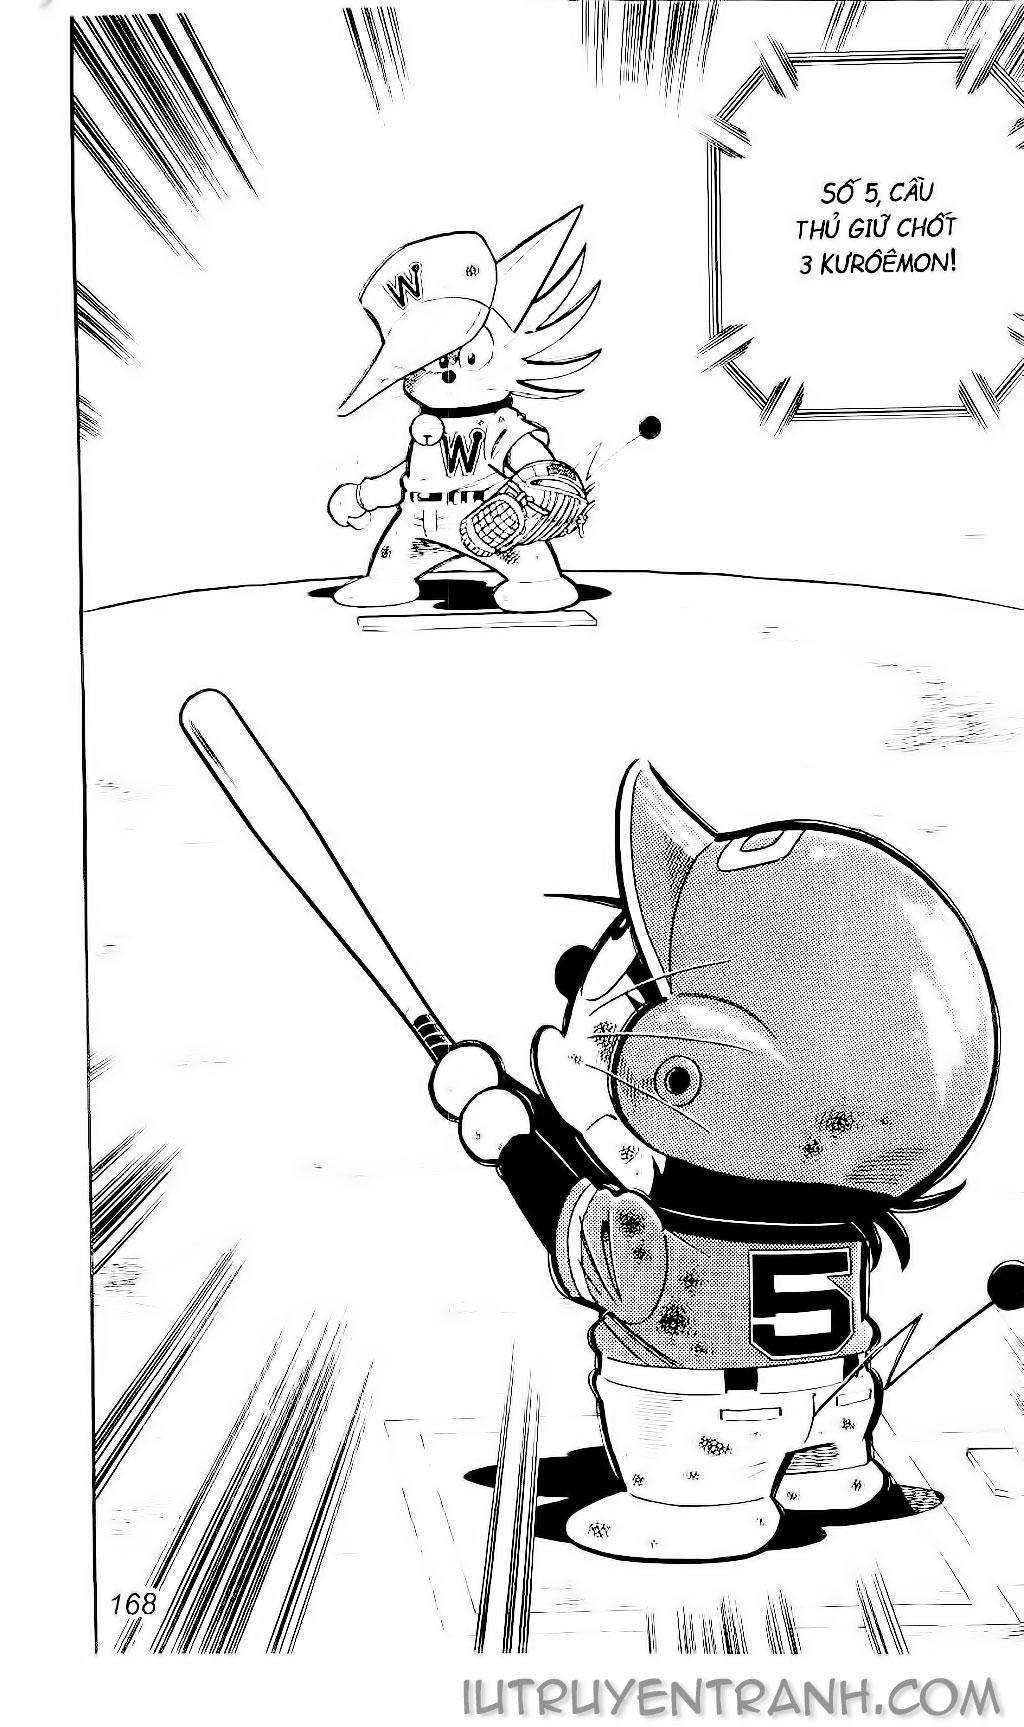 Doraemon Bóng Chày: Doraemon bóng chày (tt8) chap 139